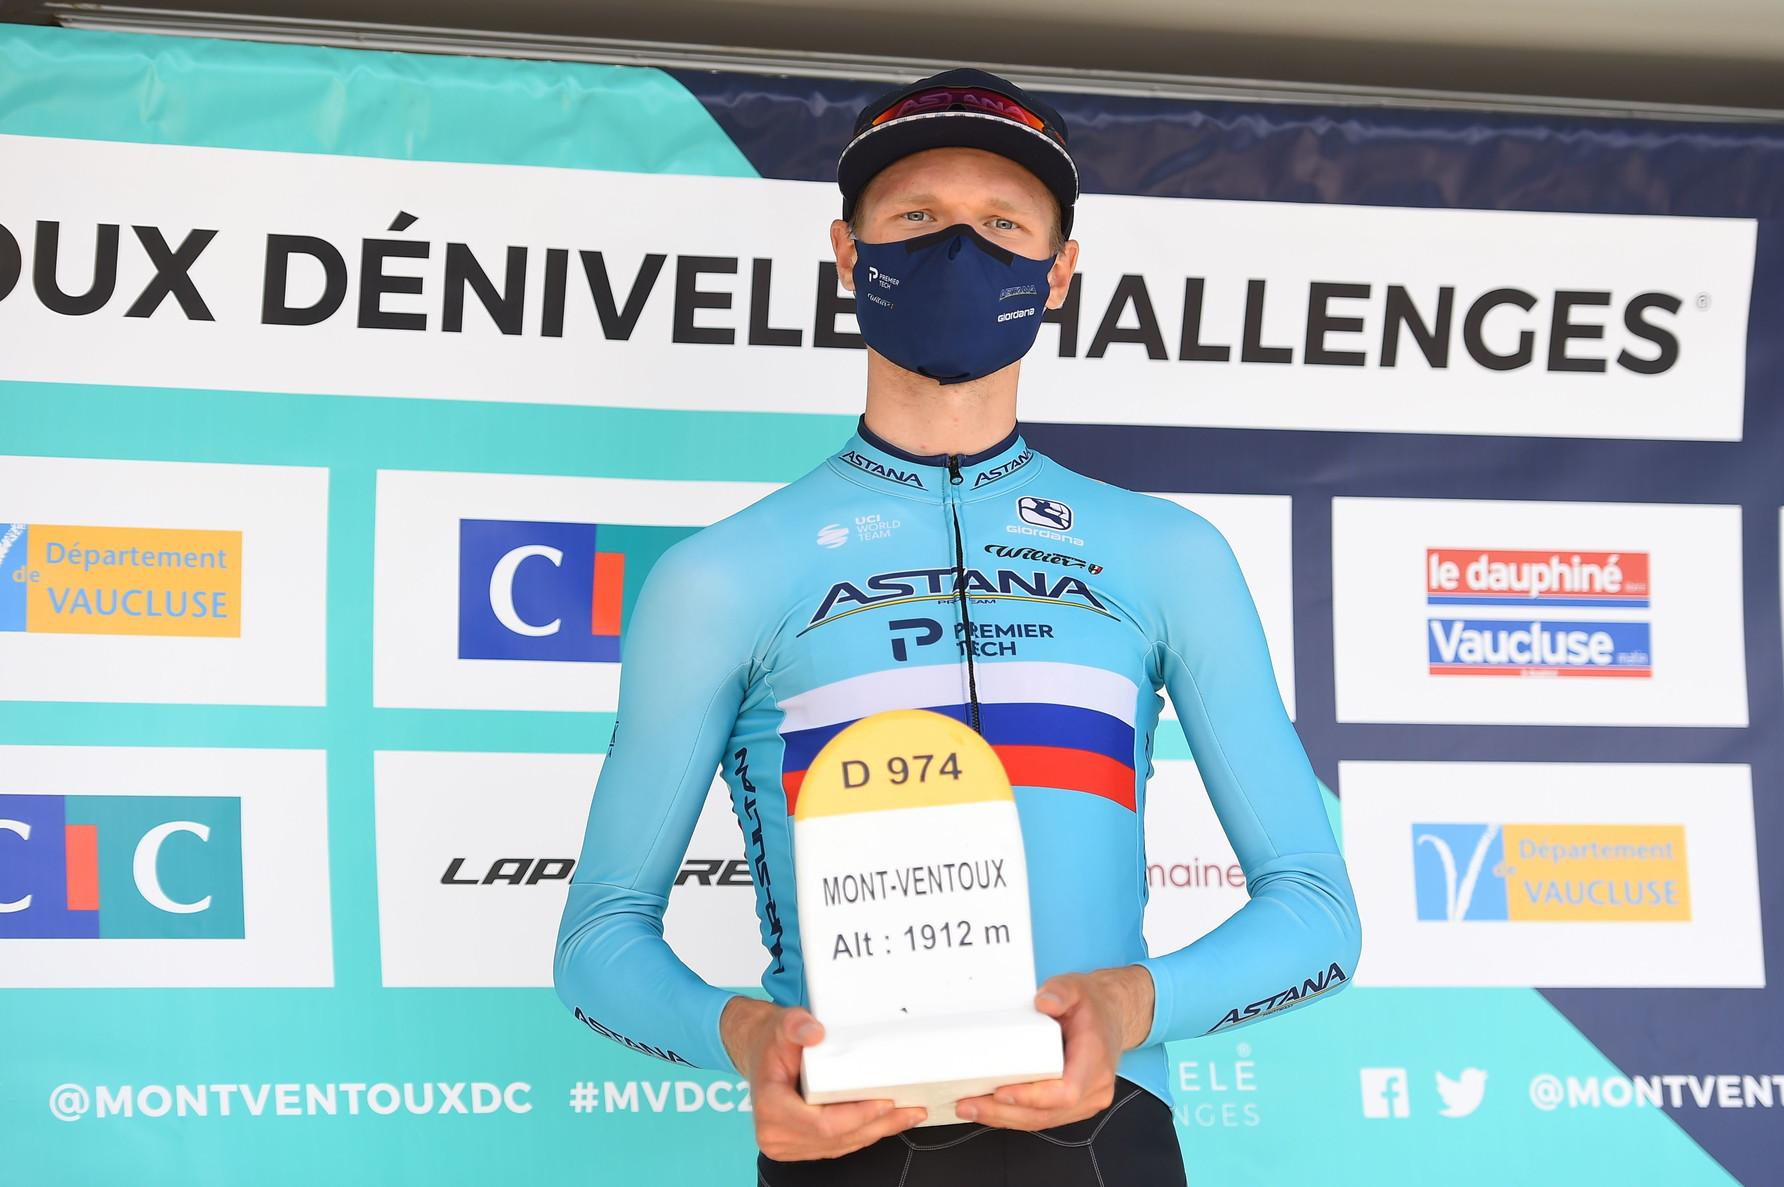 Aleksandr Vlasov dell'Astana-Premier Tech (KAZ) potrebbe essere una sorpresa.